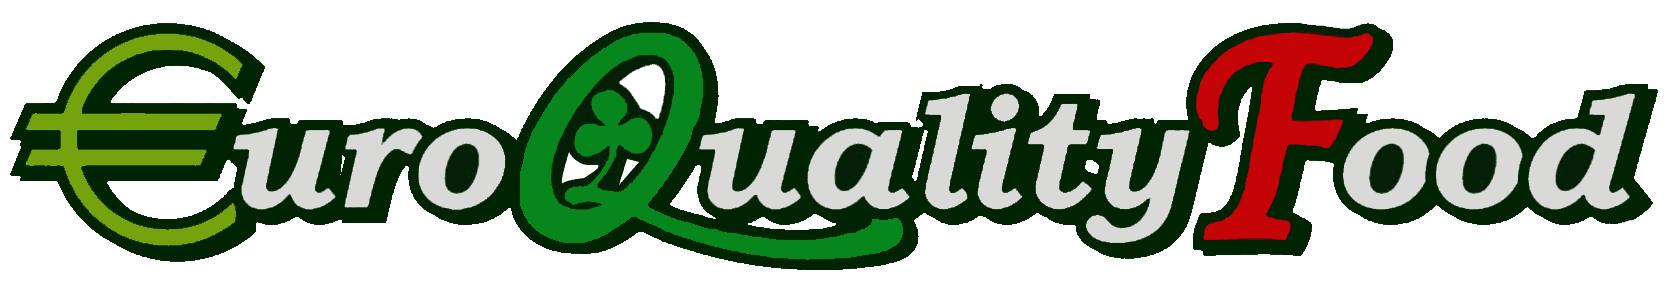 EURO QUALITY FOOD ORIA